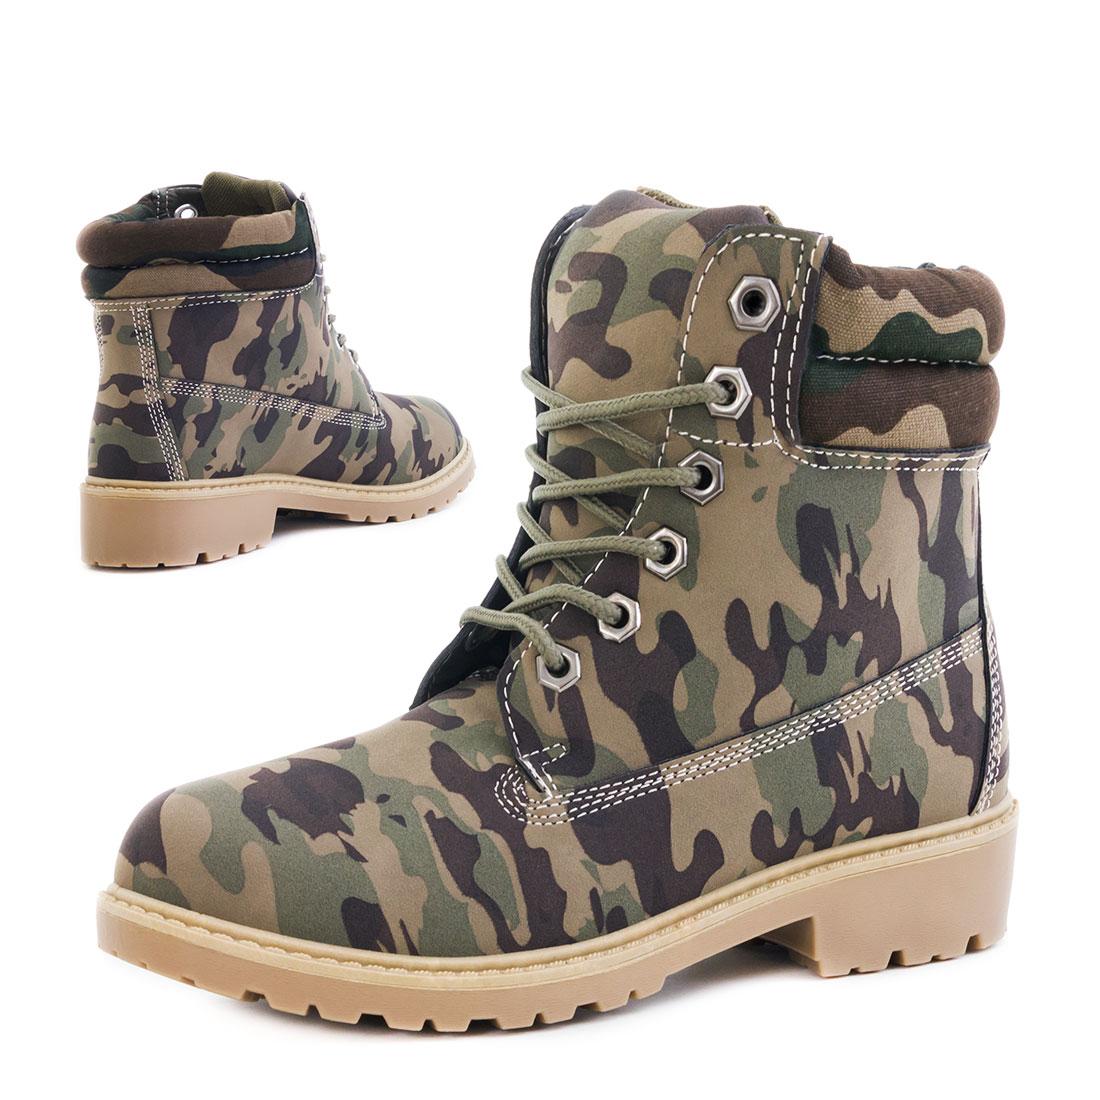 neu damen winter boots outdoor schuhe schn r stiefel gr e 37 38 39 40 41 42 43. Black Bedroom Furniture Sets. Home Design Ideas